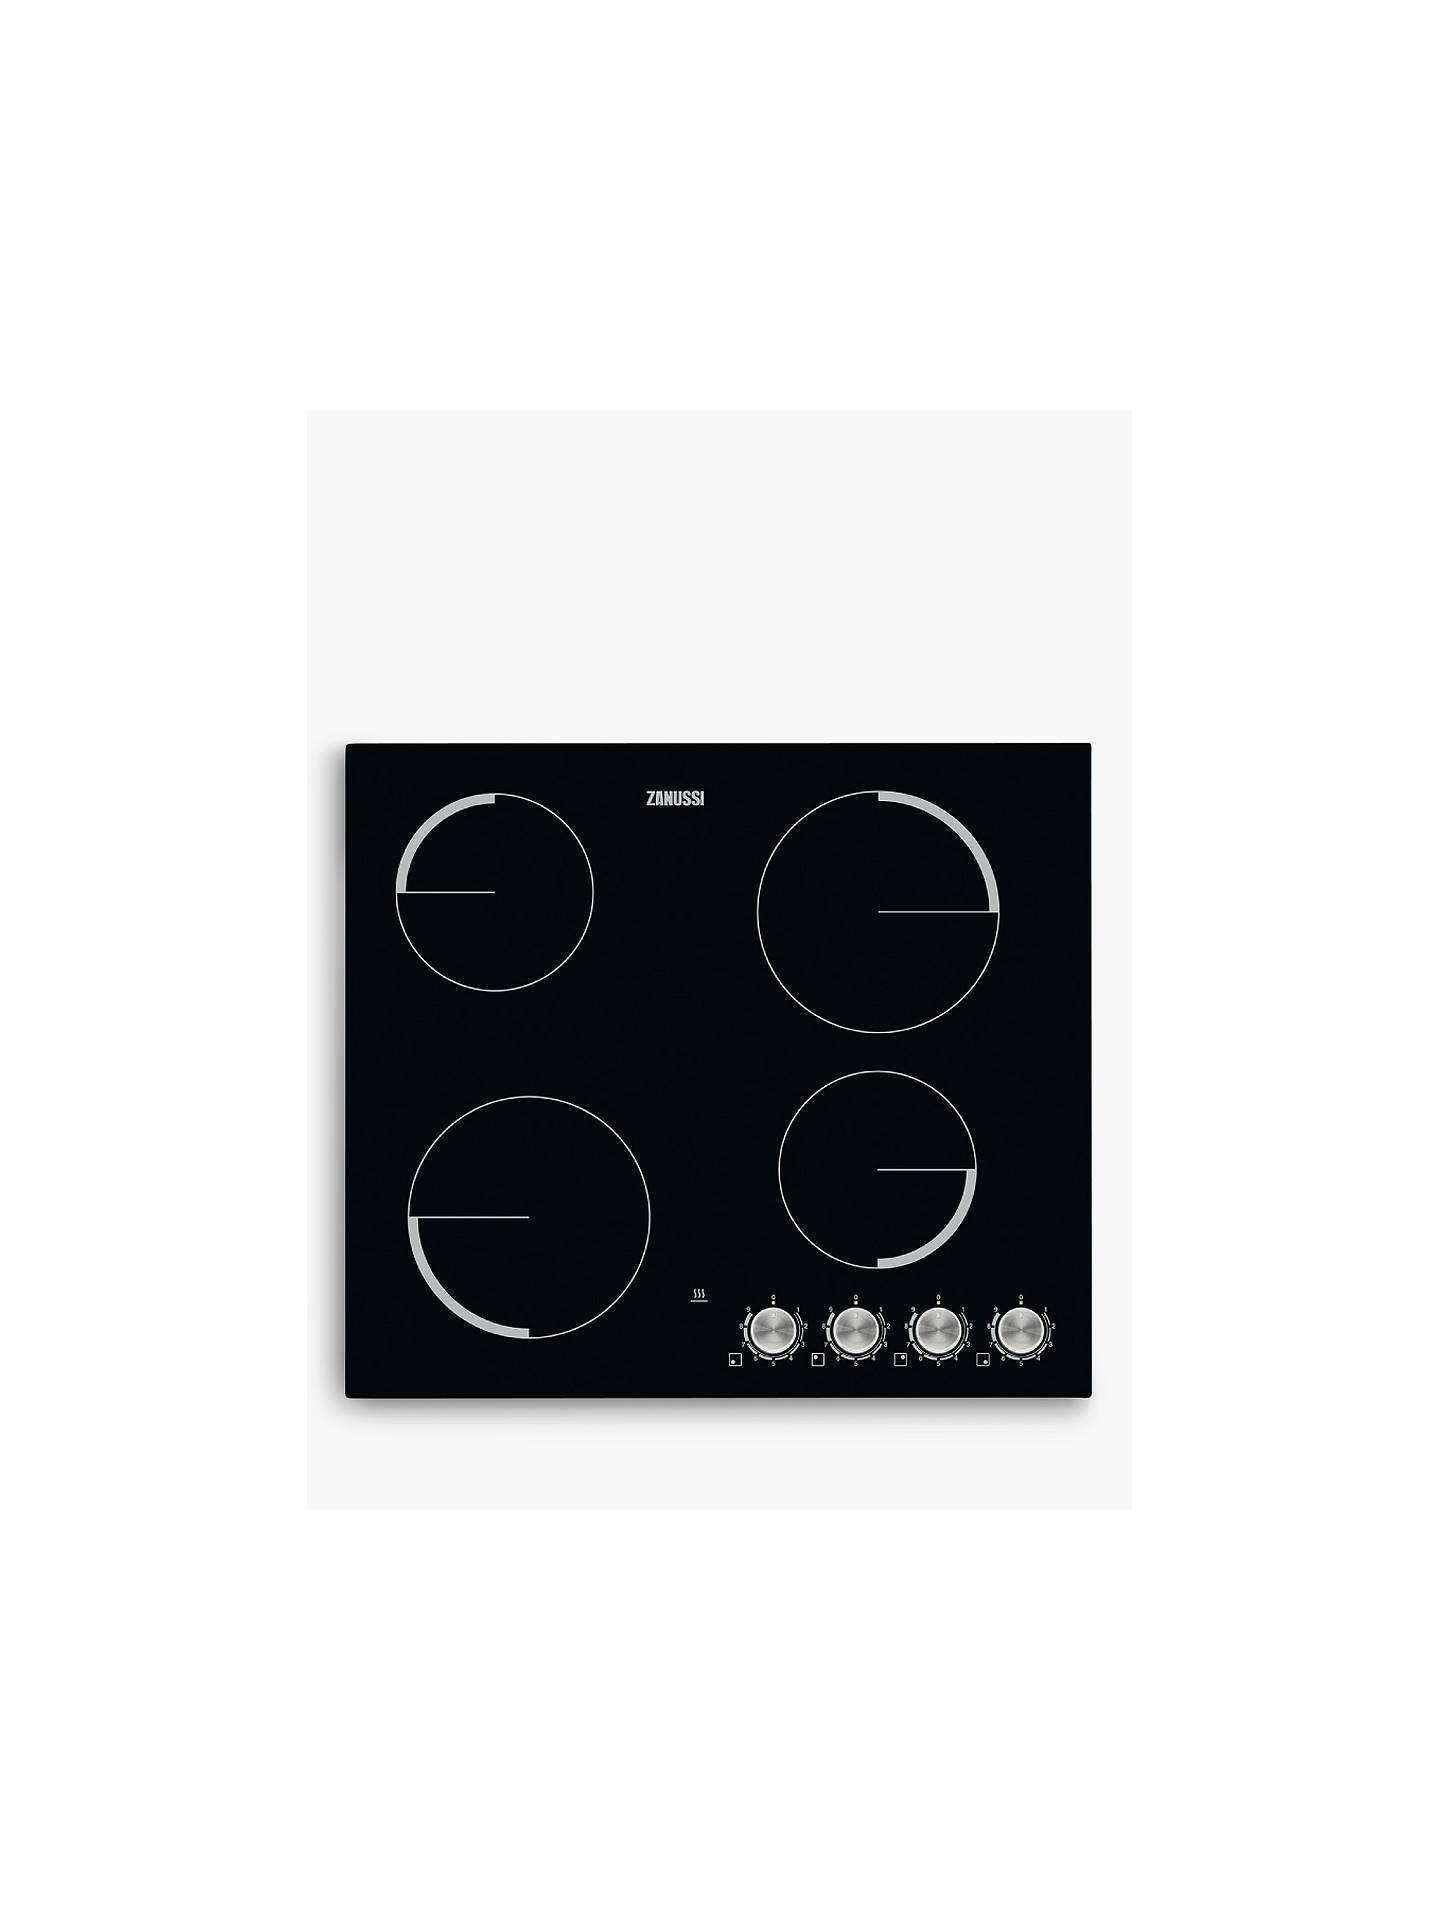 Stupendous Zanussi Zv694Nk Electric Ceramic Hob Black At John Lewis Partners Wiring Database Xlexigelartorg